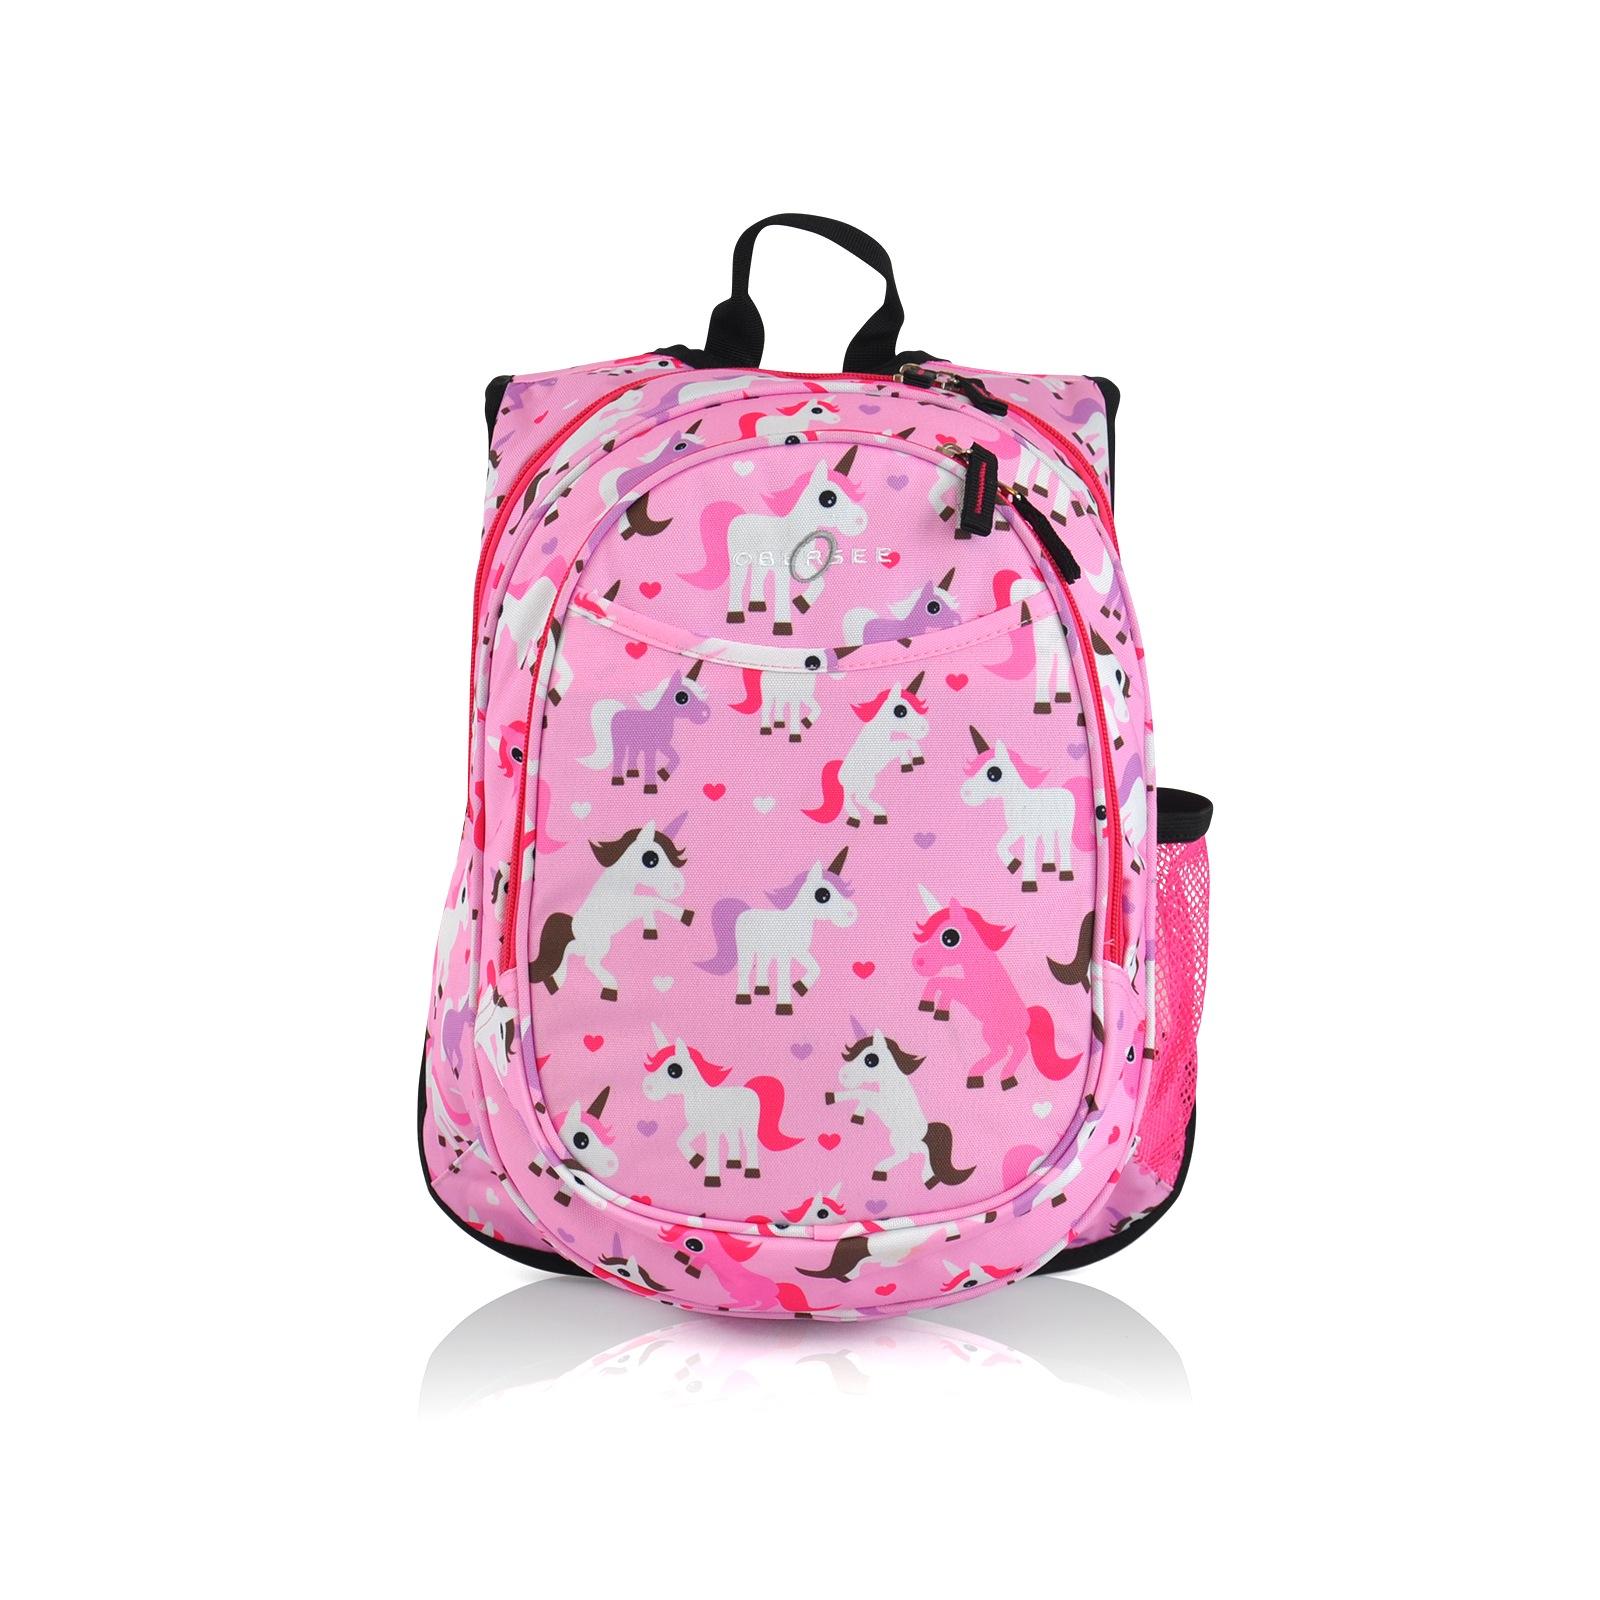 pink travel backpack for kids